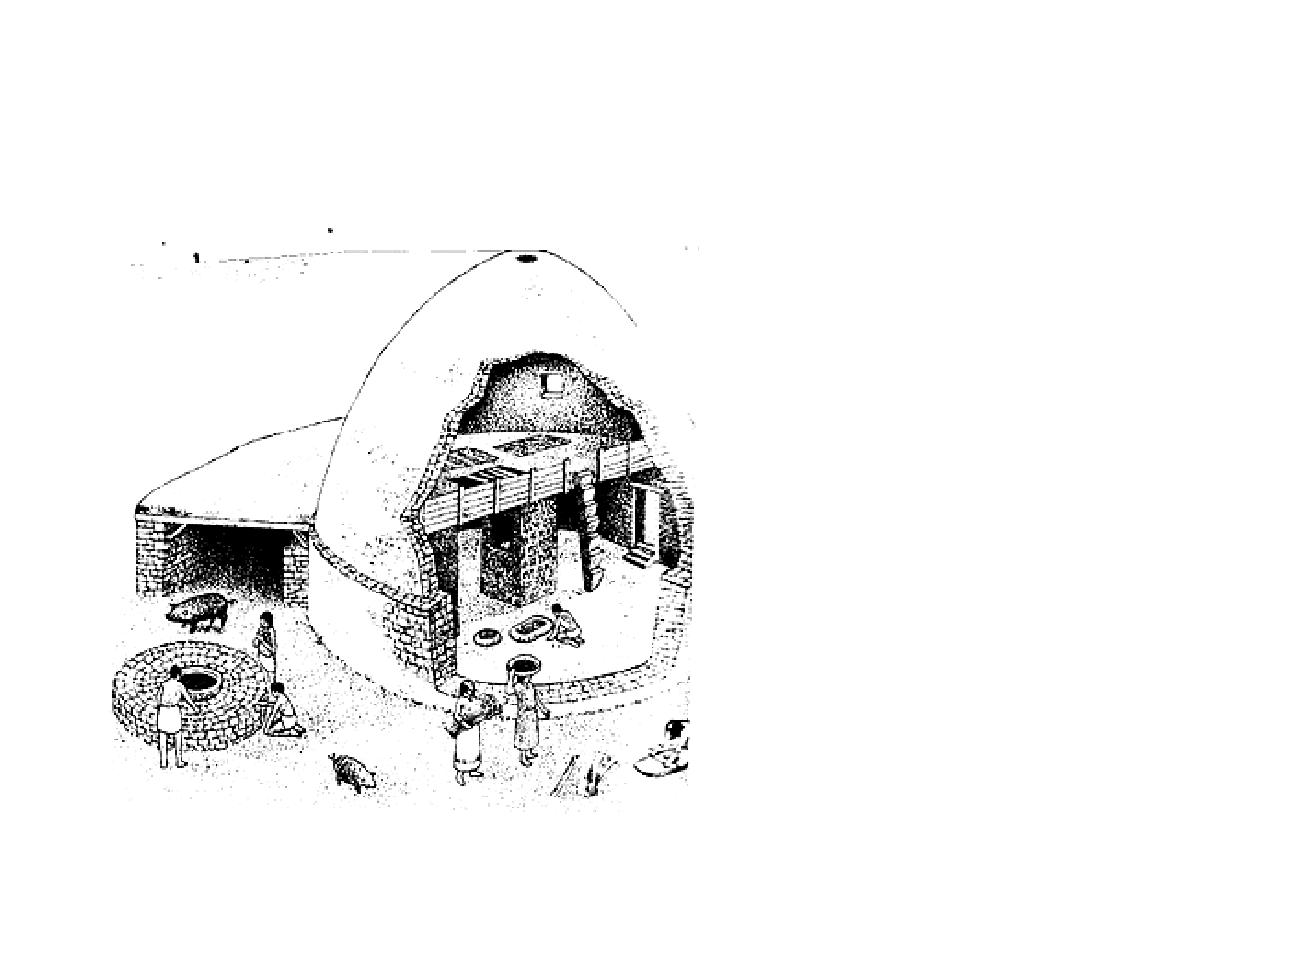 Prehistory Evolution Of Houses Khirokitia In Cyprus 5650 Bc Ancient Mesopotamia Prehistory Mesopotamia